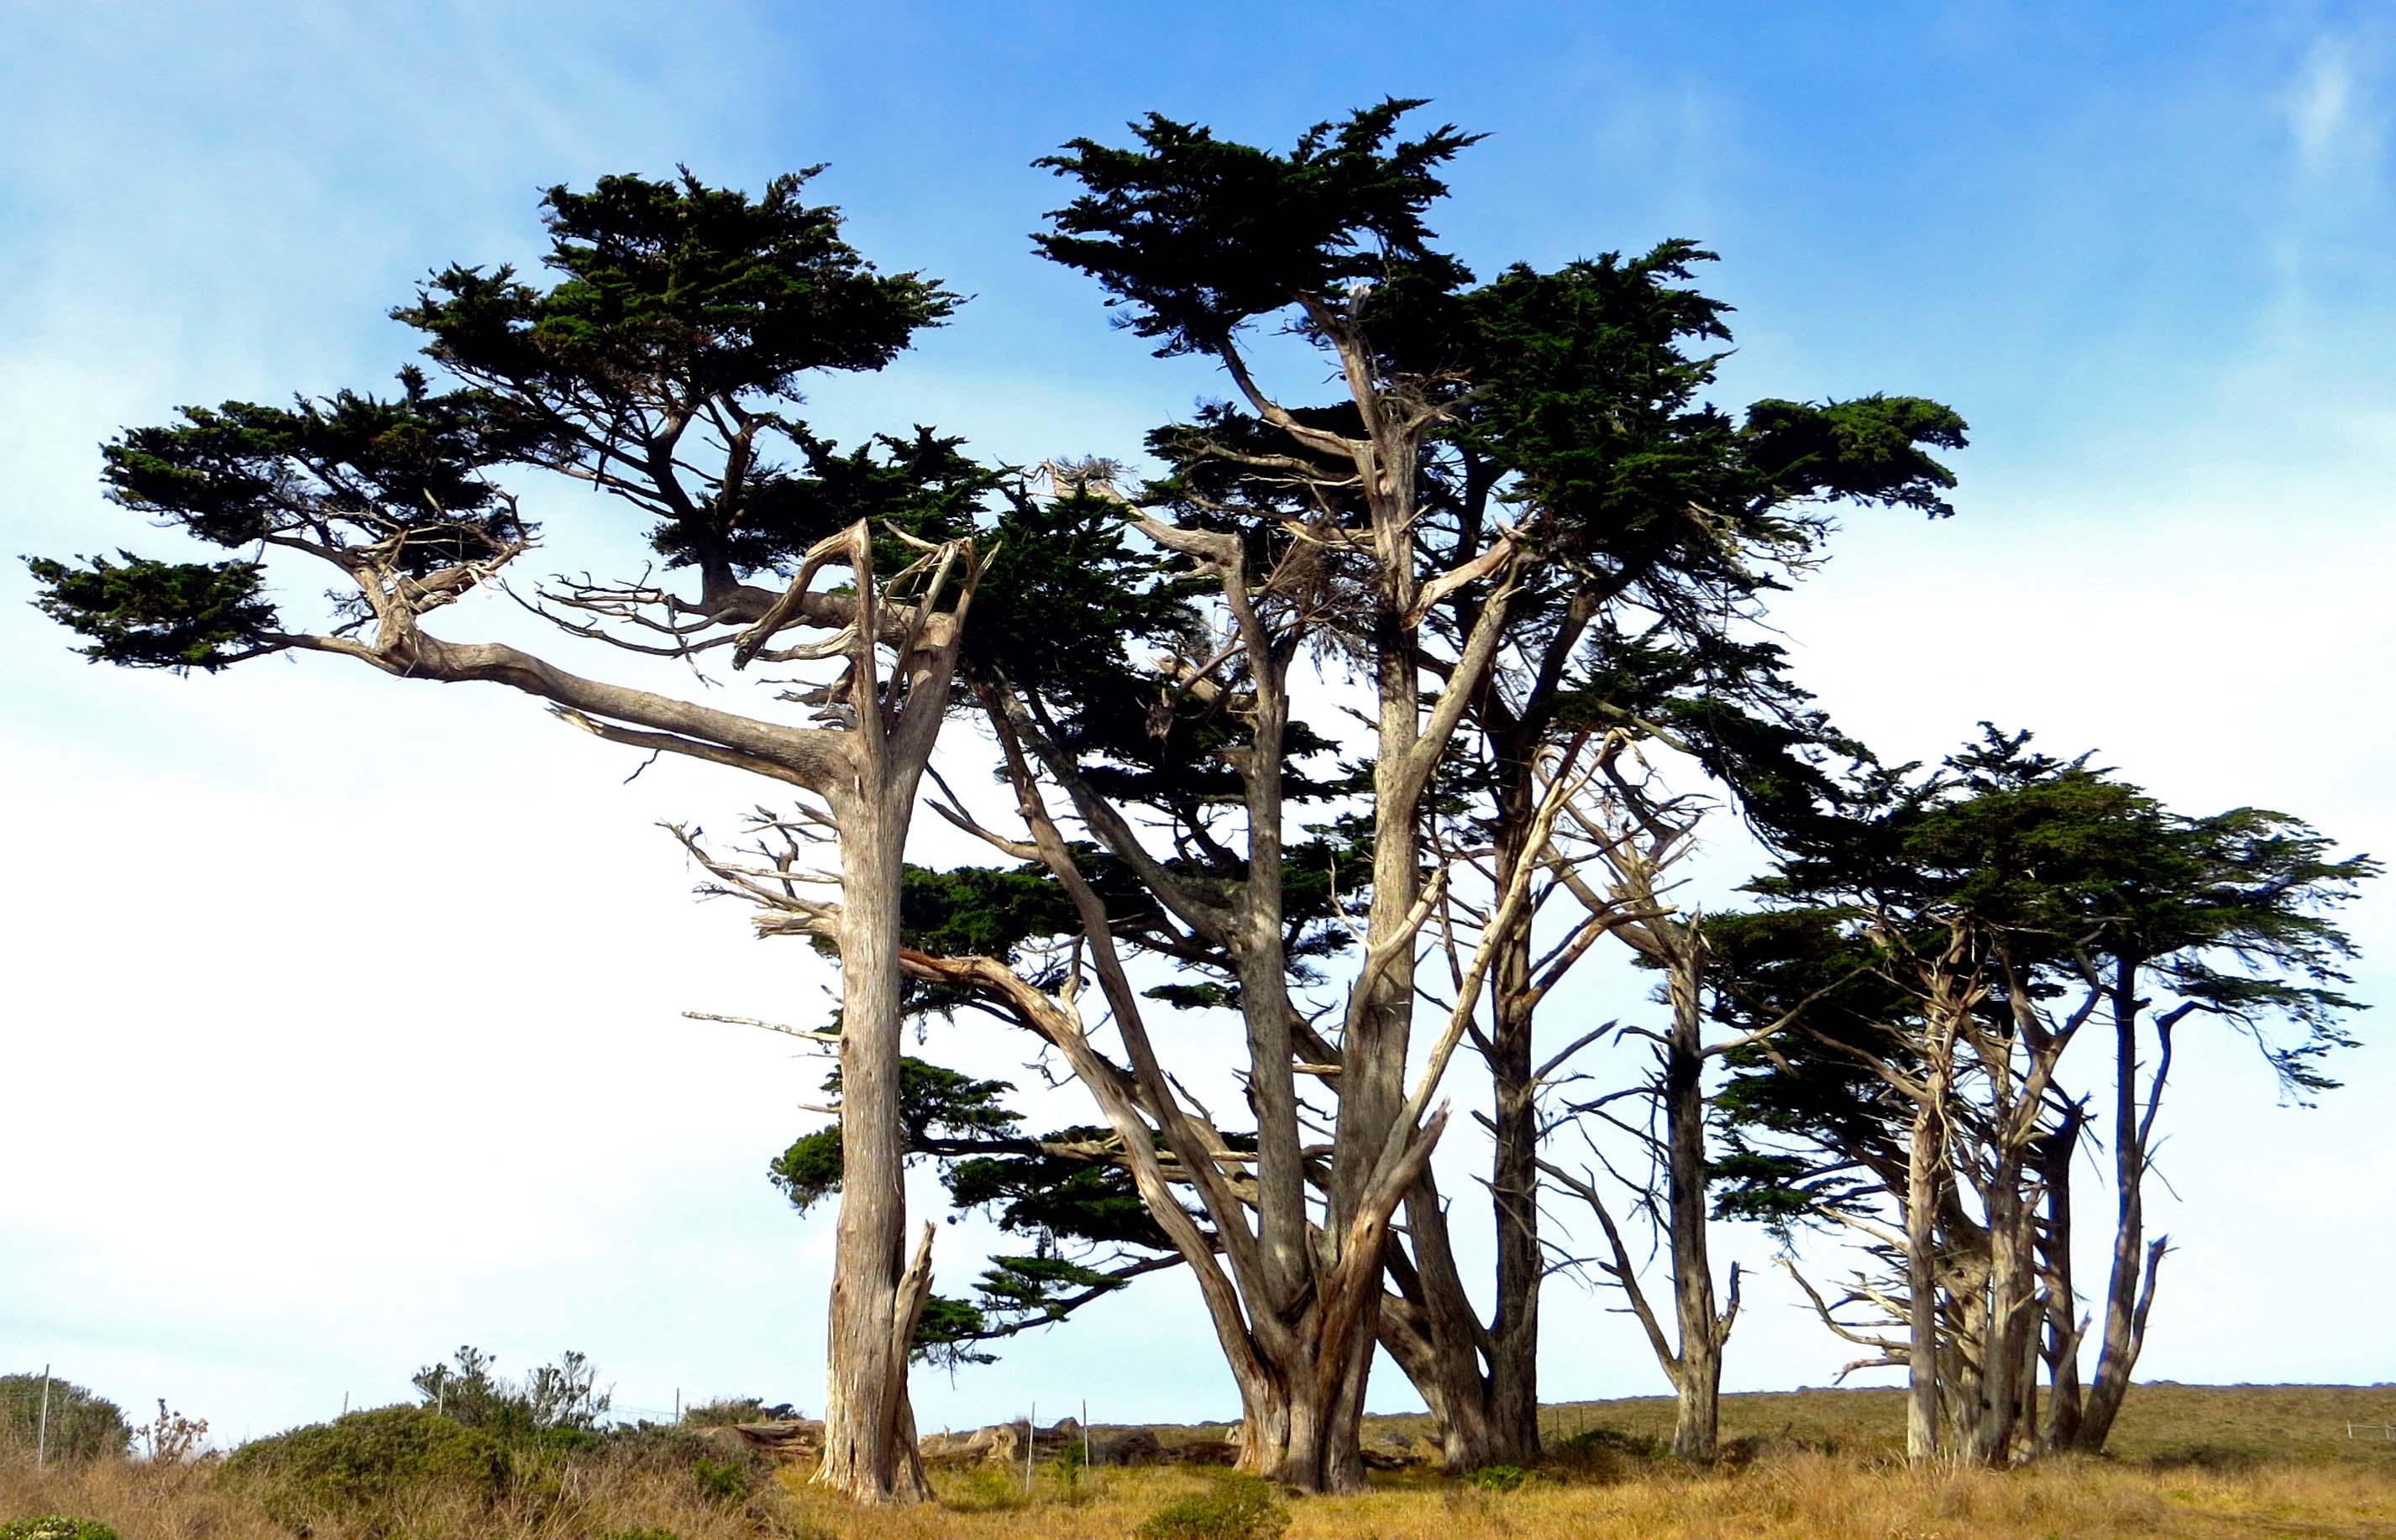 Photo of cypress tree wind break on Pierce Ranch inPt. Reyes National Seashore. Photo by Curtis Mekemson.